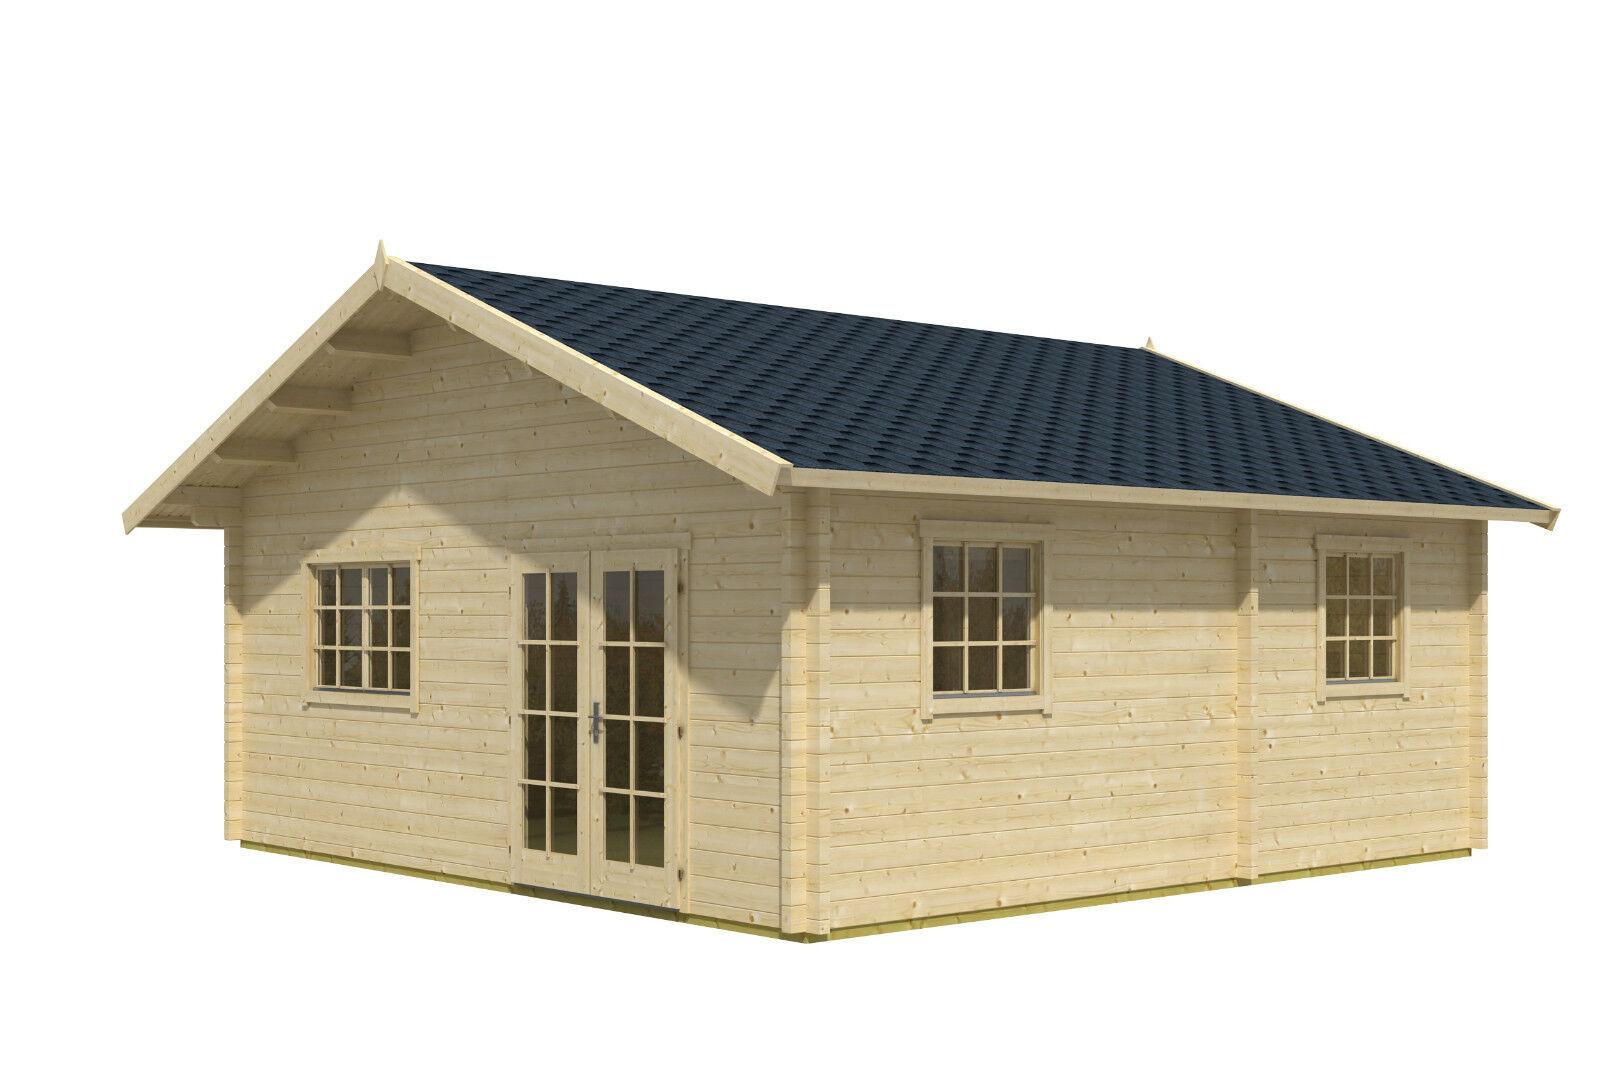 70 mm ferienhaus valga 620x620cm terrasse gartenhaus blockhaus holzhaus neu ebay. Black Bedroom Furniture Sets. Home Design Ideas